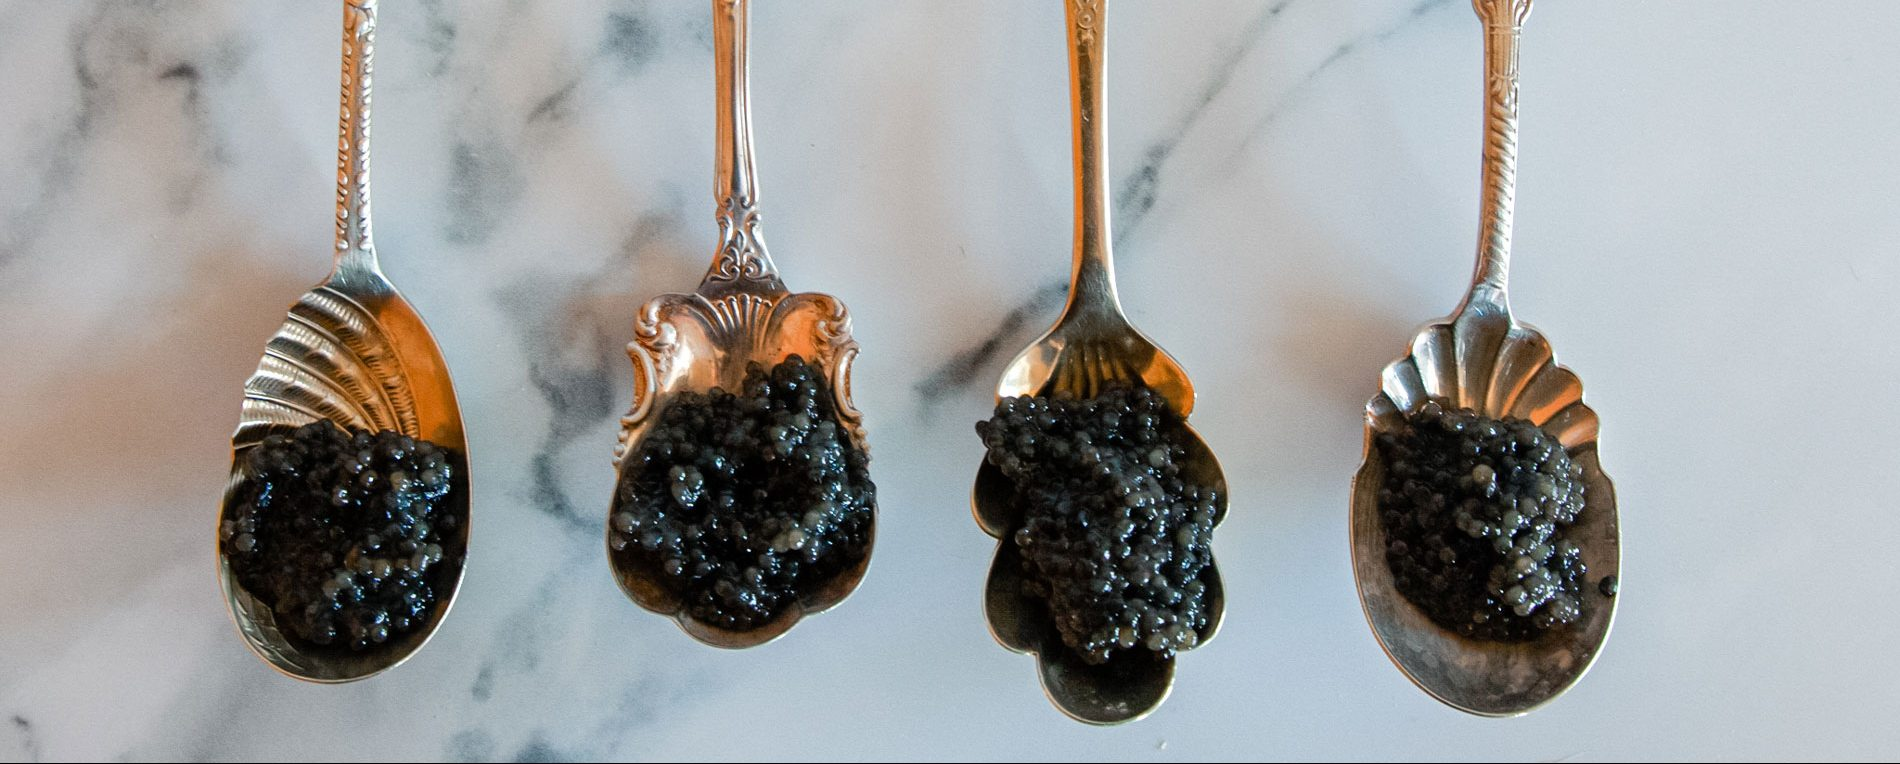 Ornate spoonfuls of black caviar.